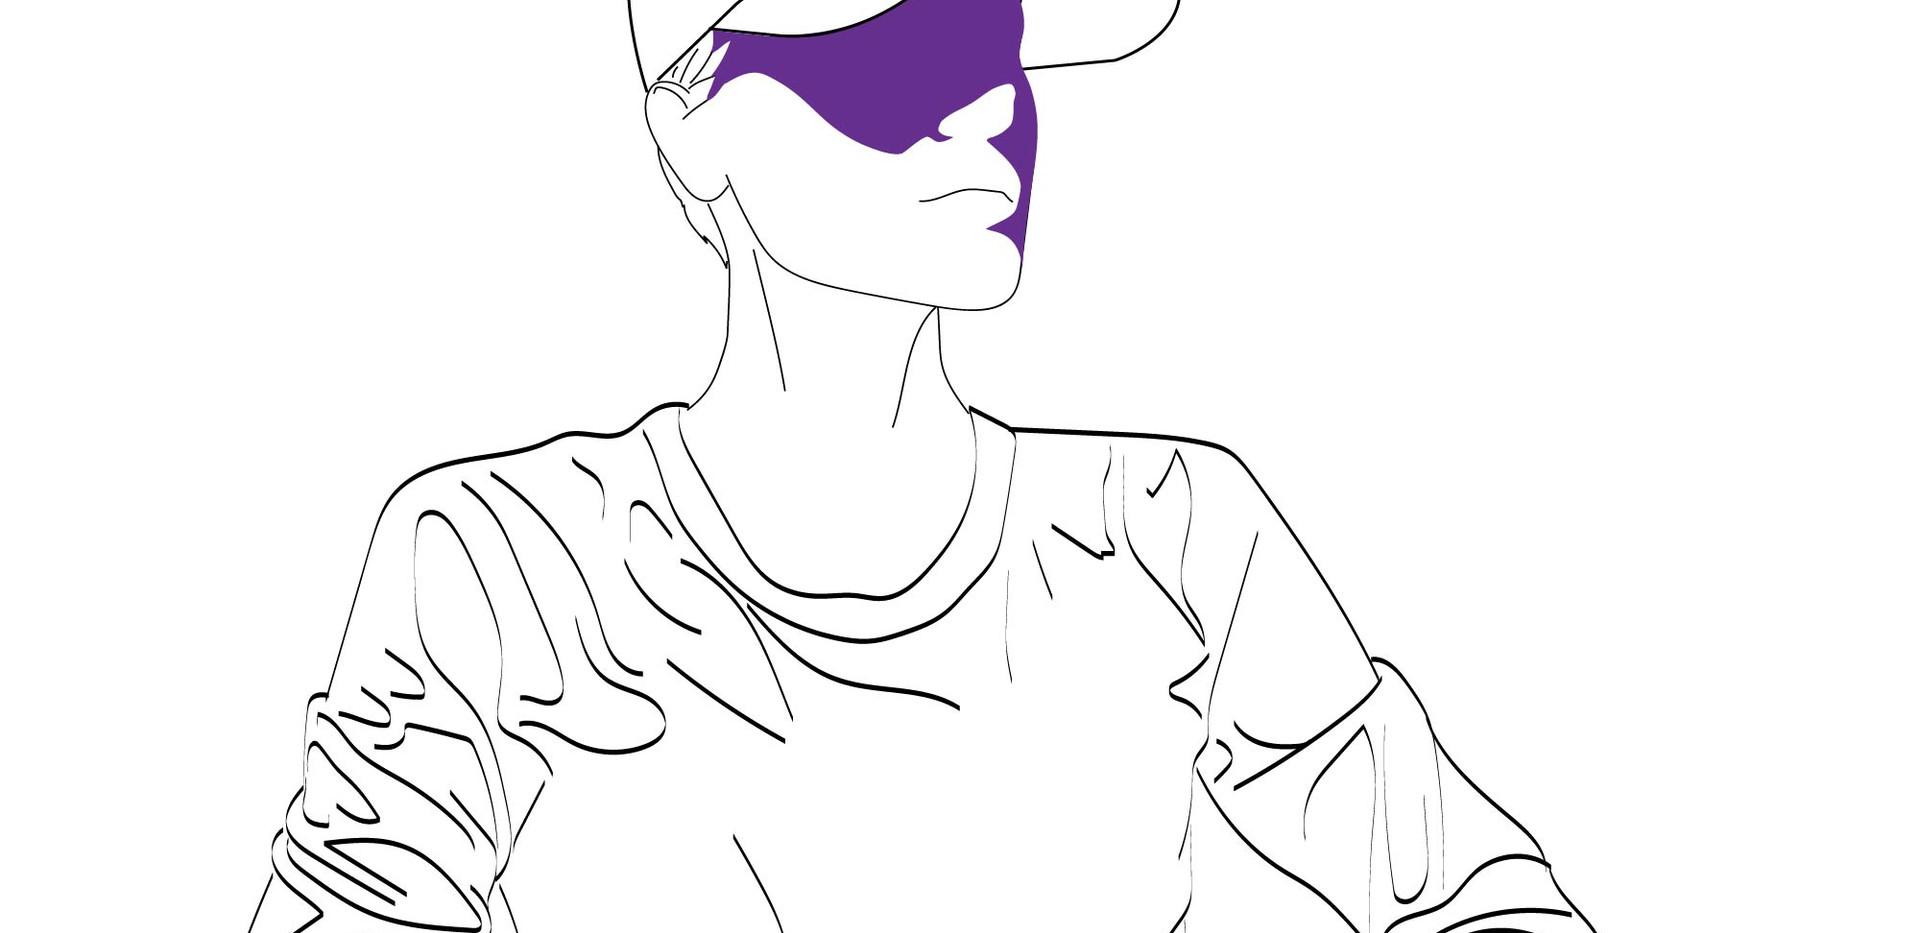 Christina Geoghegan, Call me purple